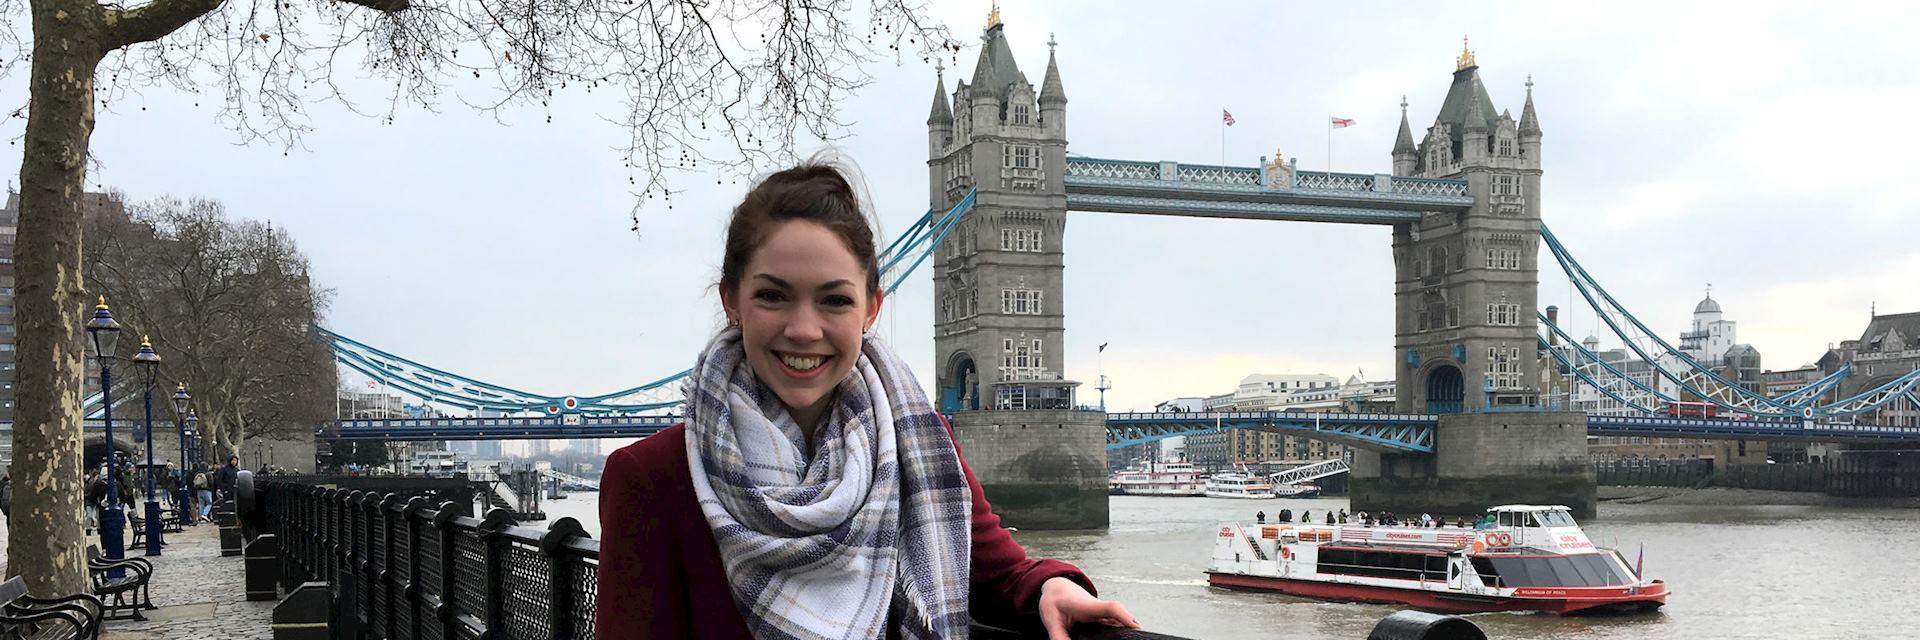 Anna at Tower Bridge, London, England